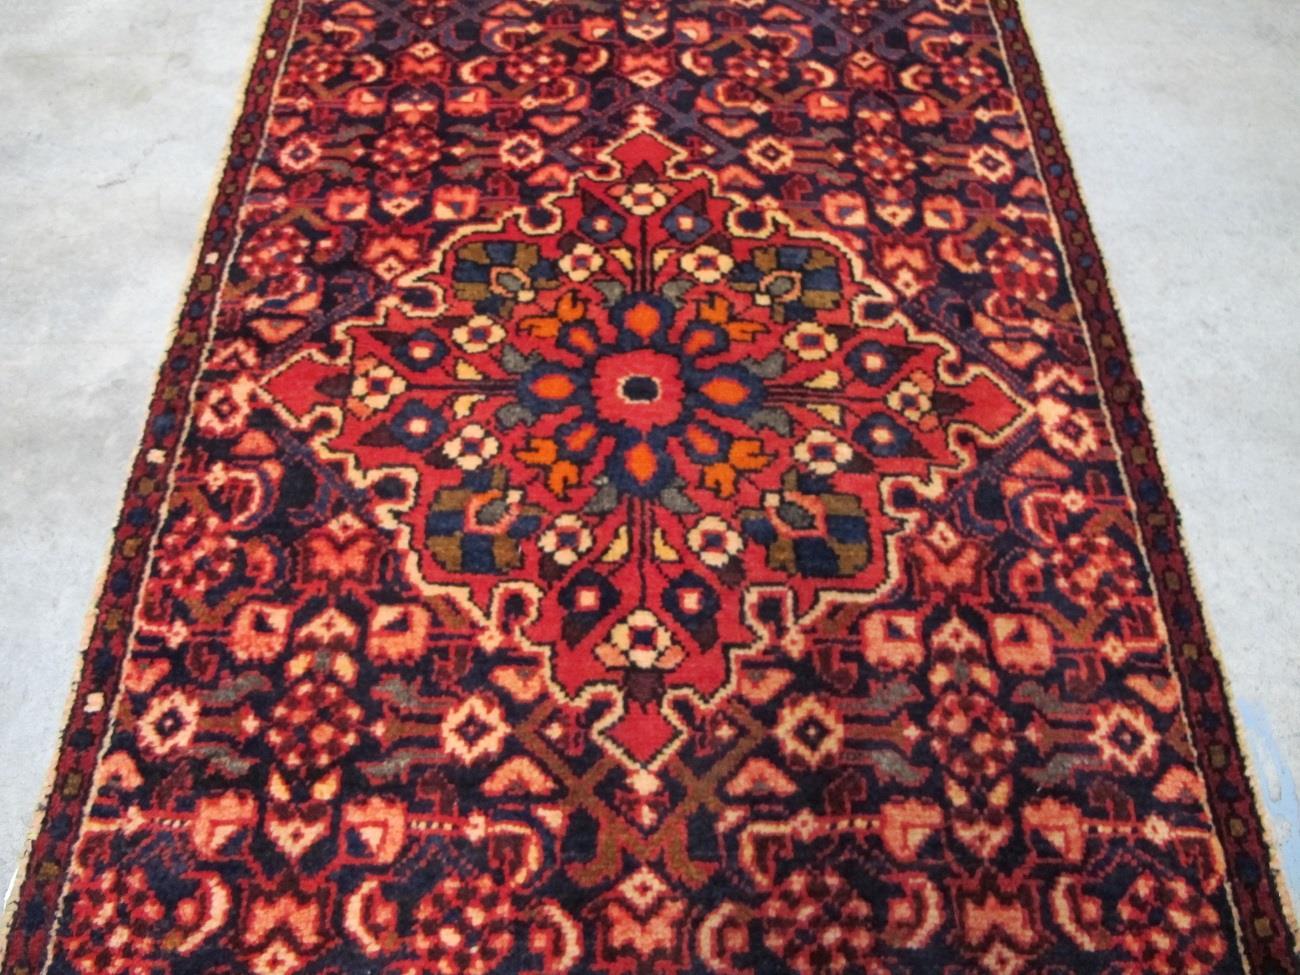 Persian Rugs Melbourne The Red Carpet Australia In